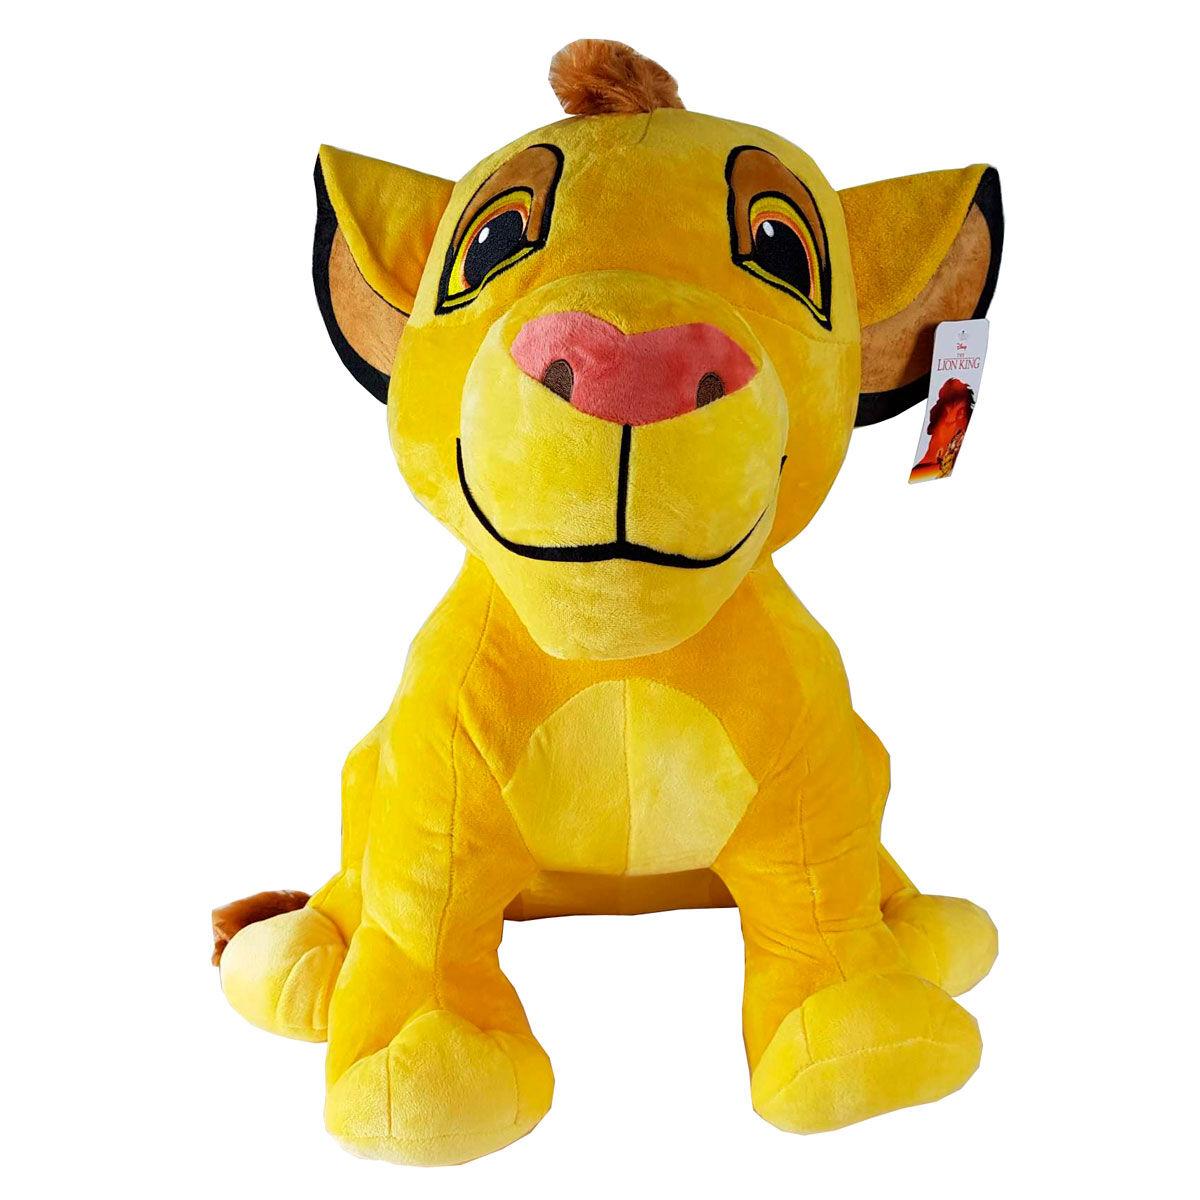 Peluche Simba El Rey Leon Disney soft 58cm